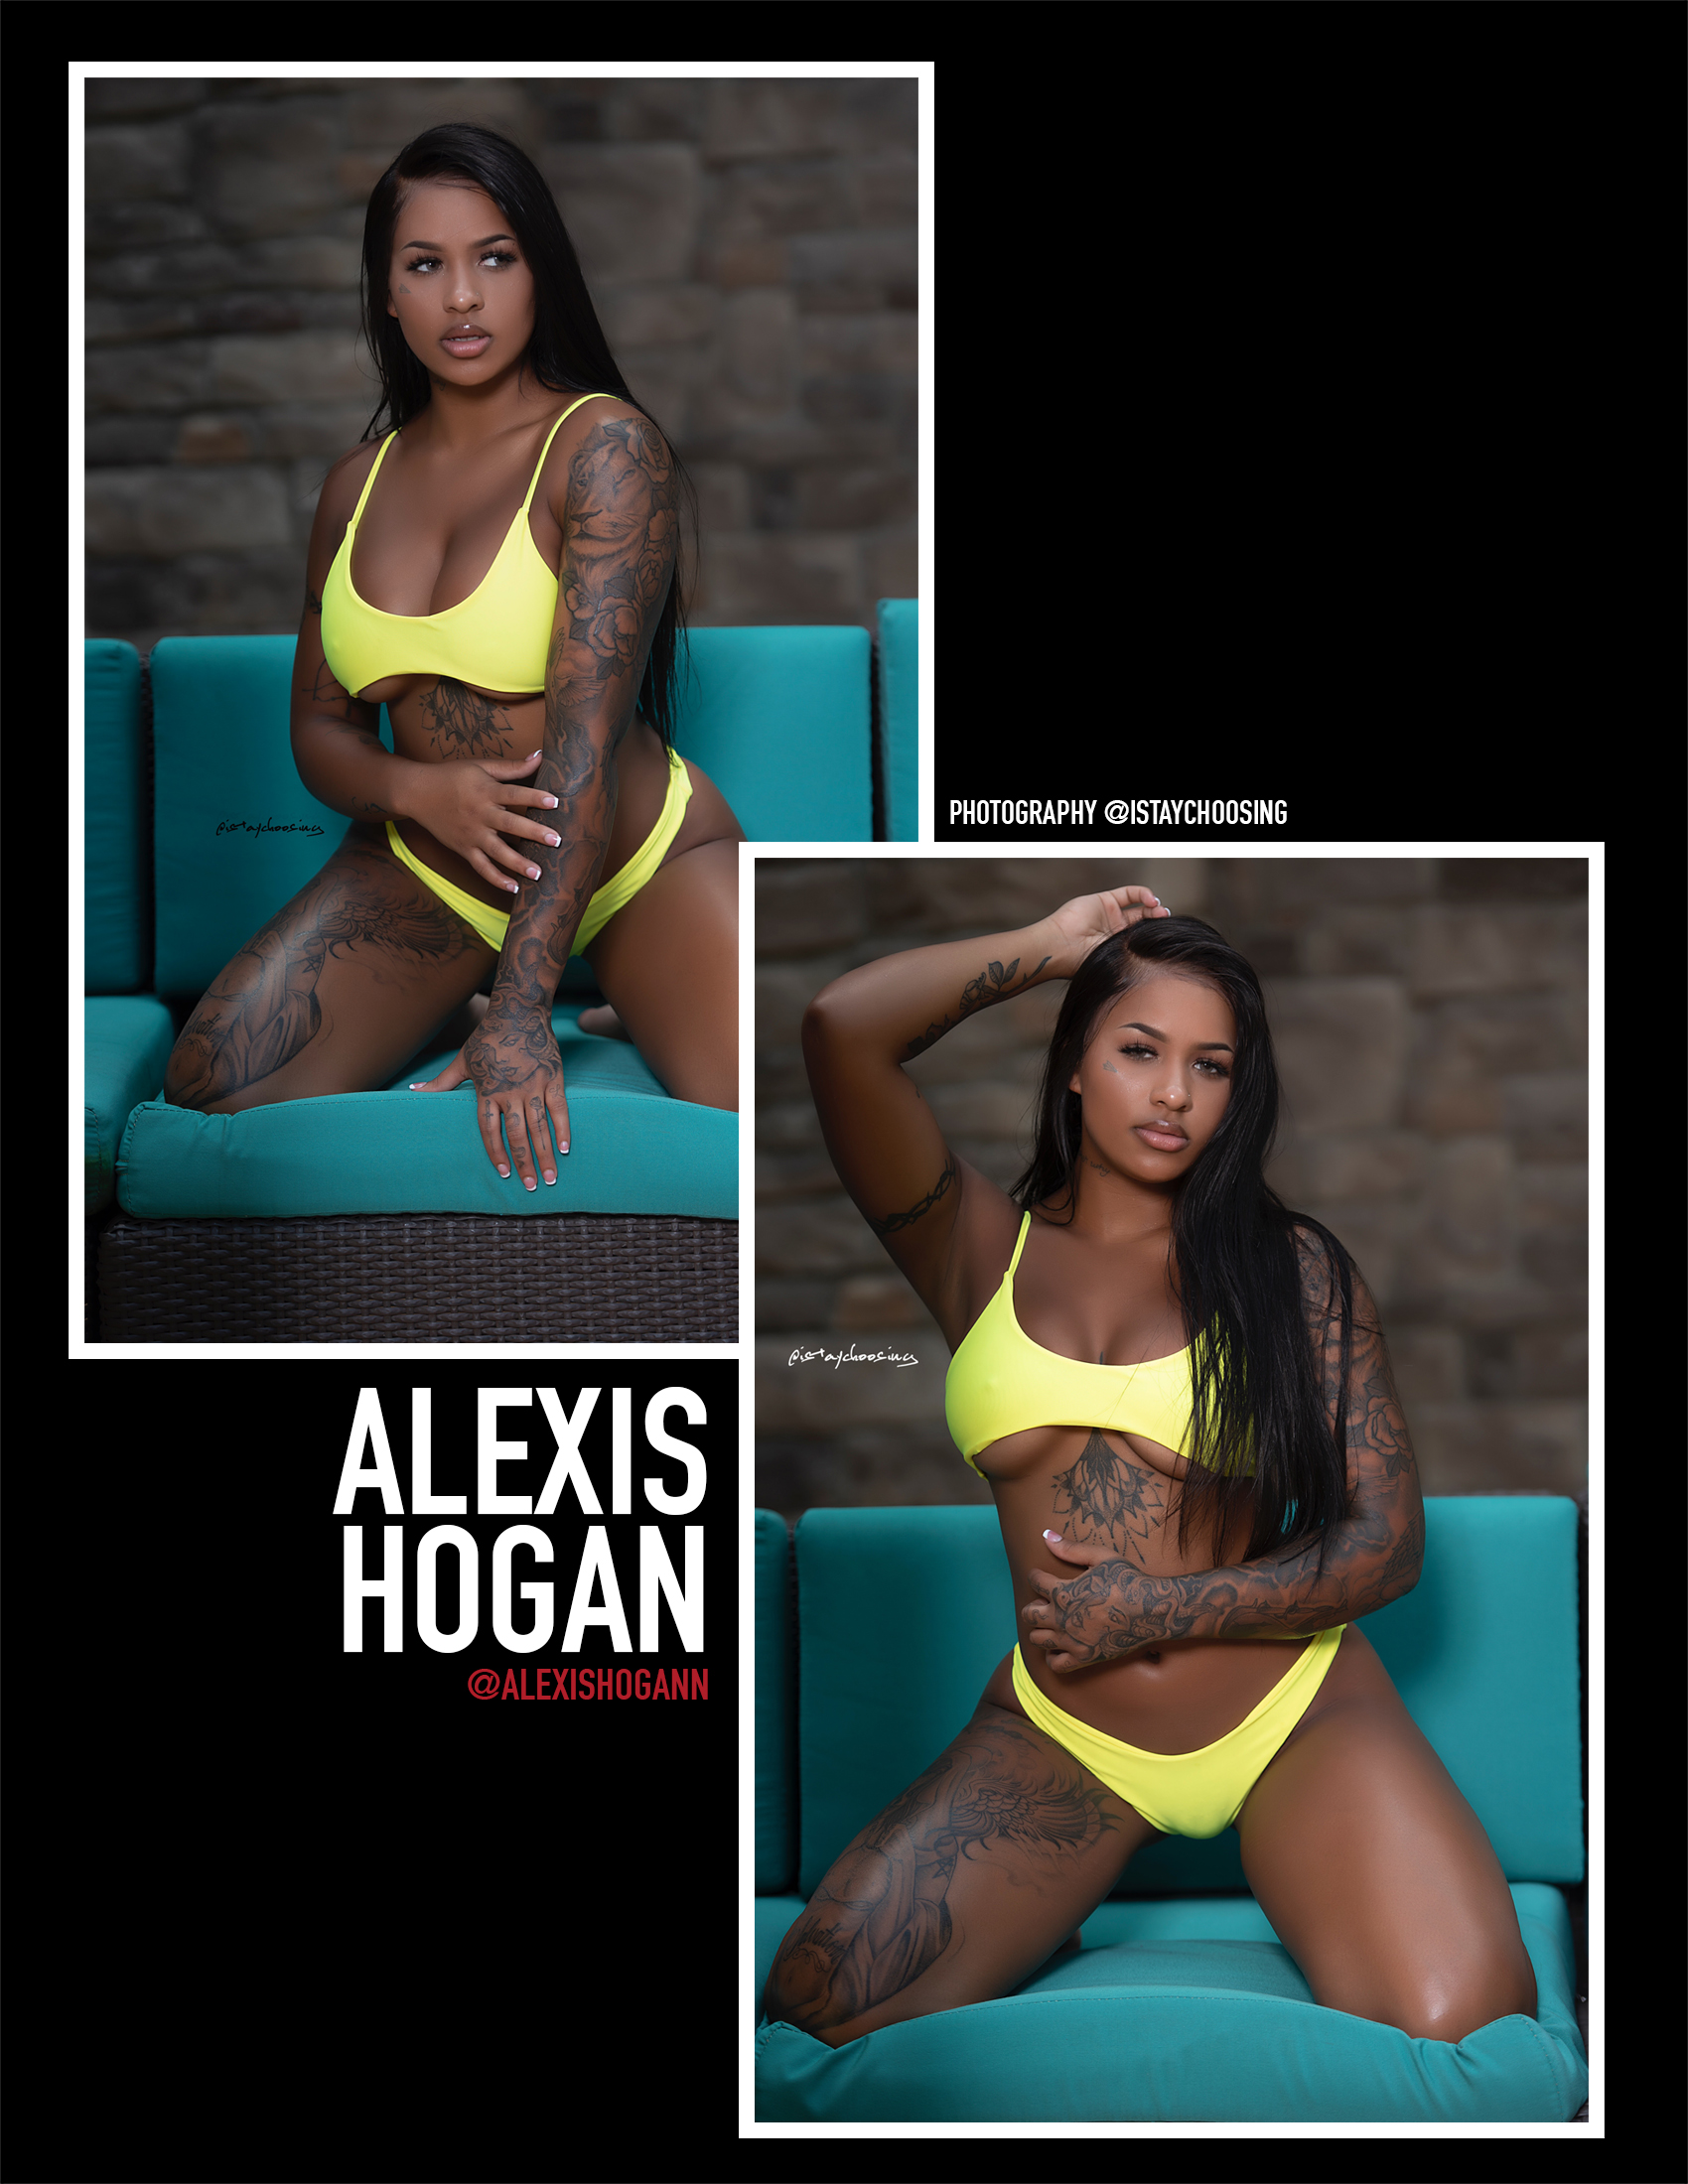 RockLan One Magazine - Alexis Hogan